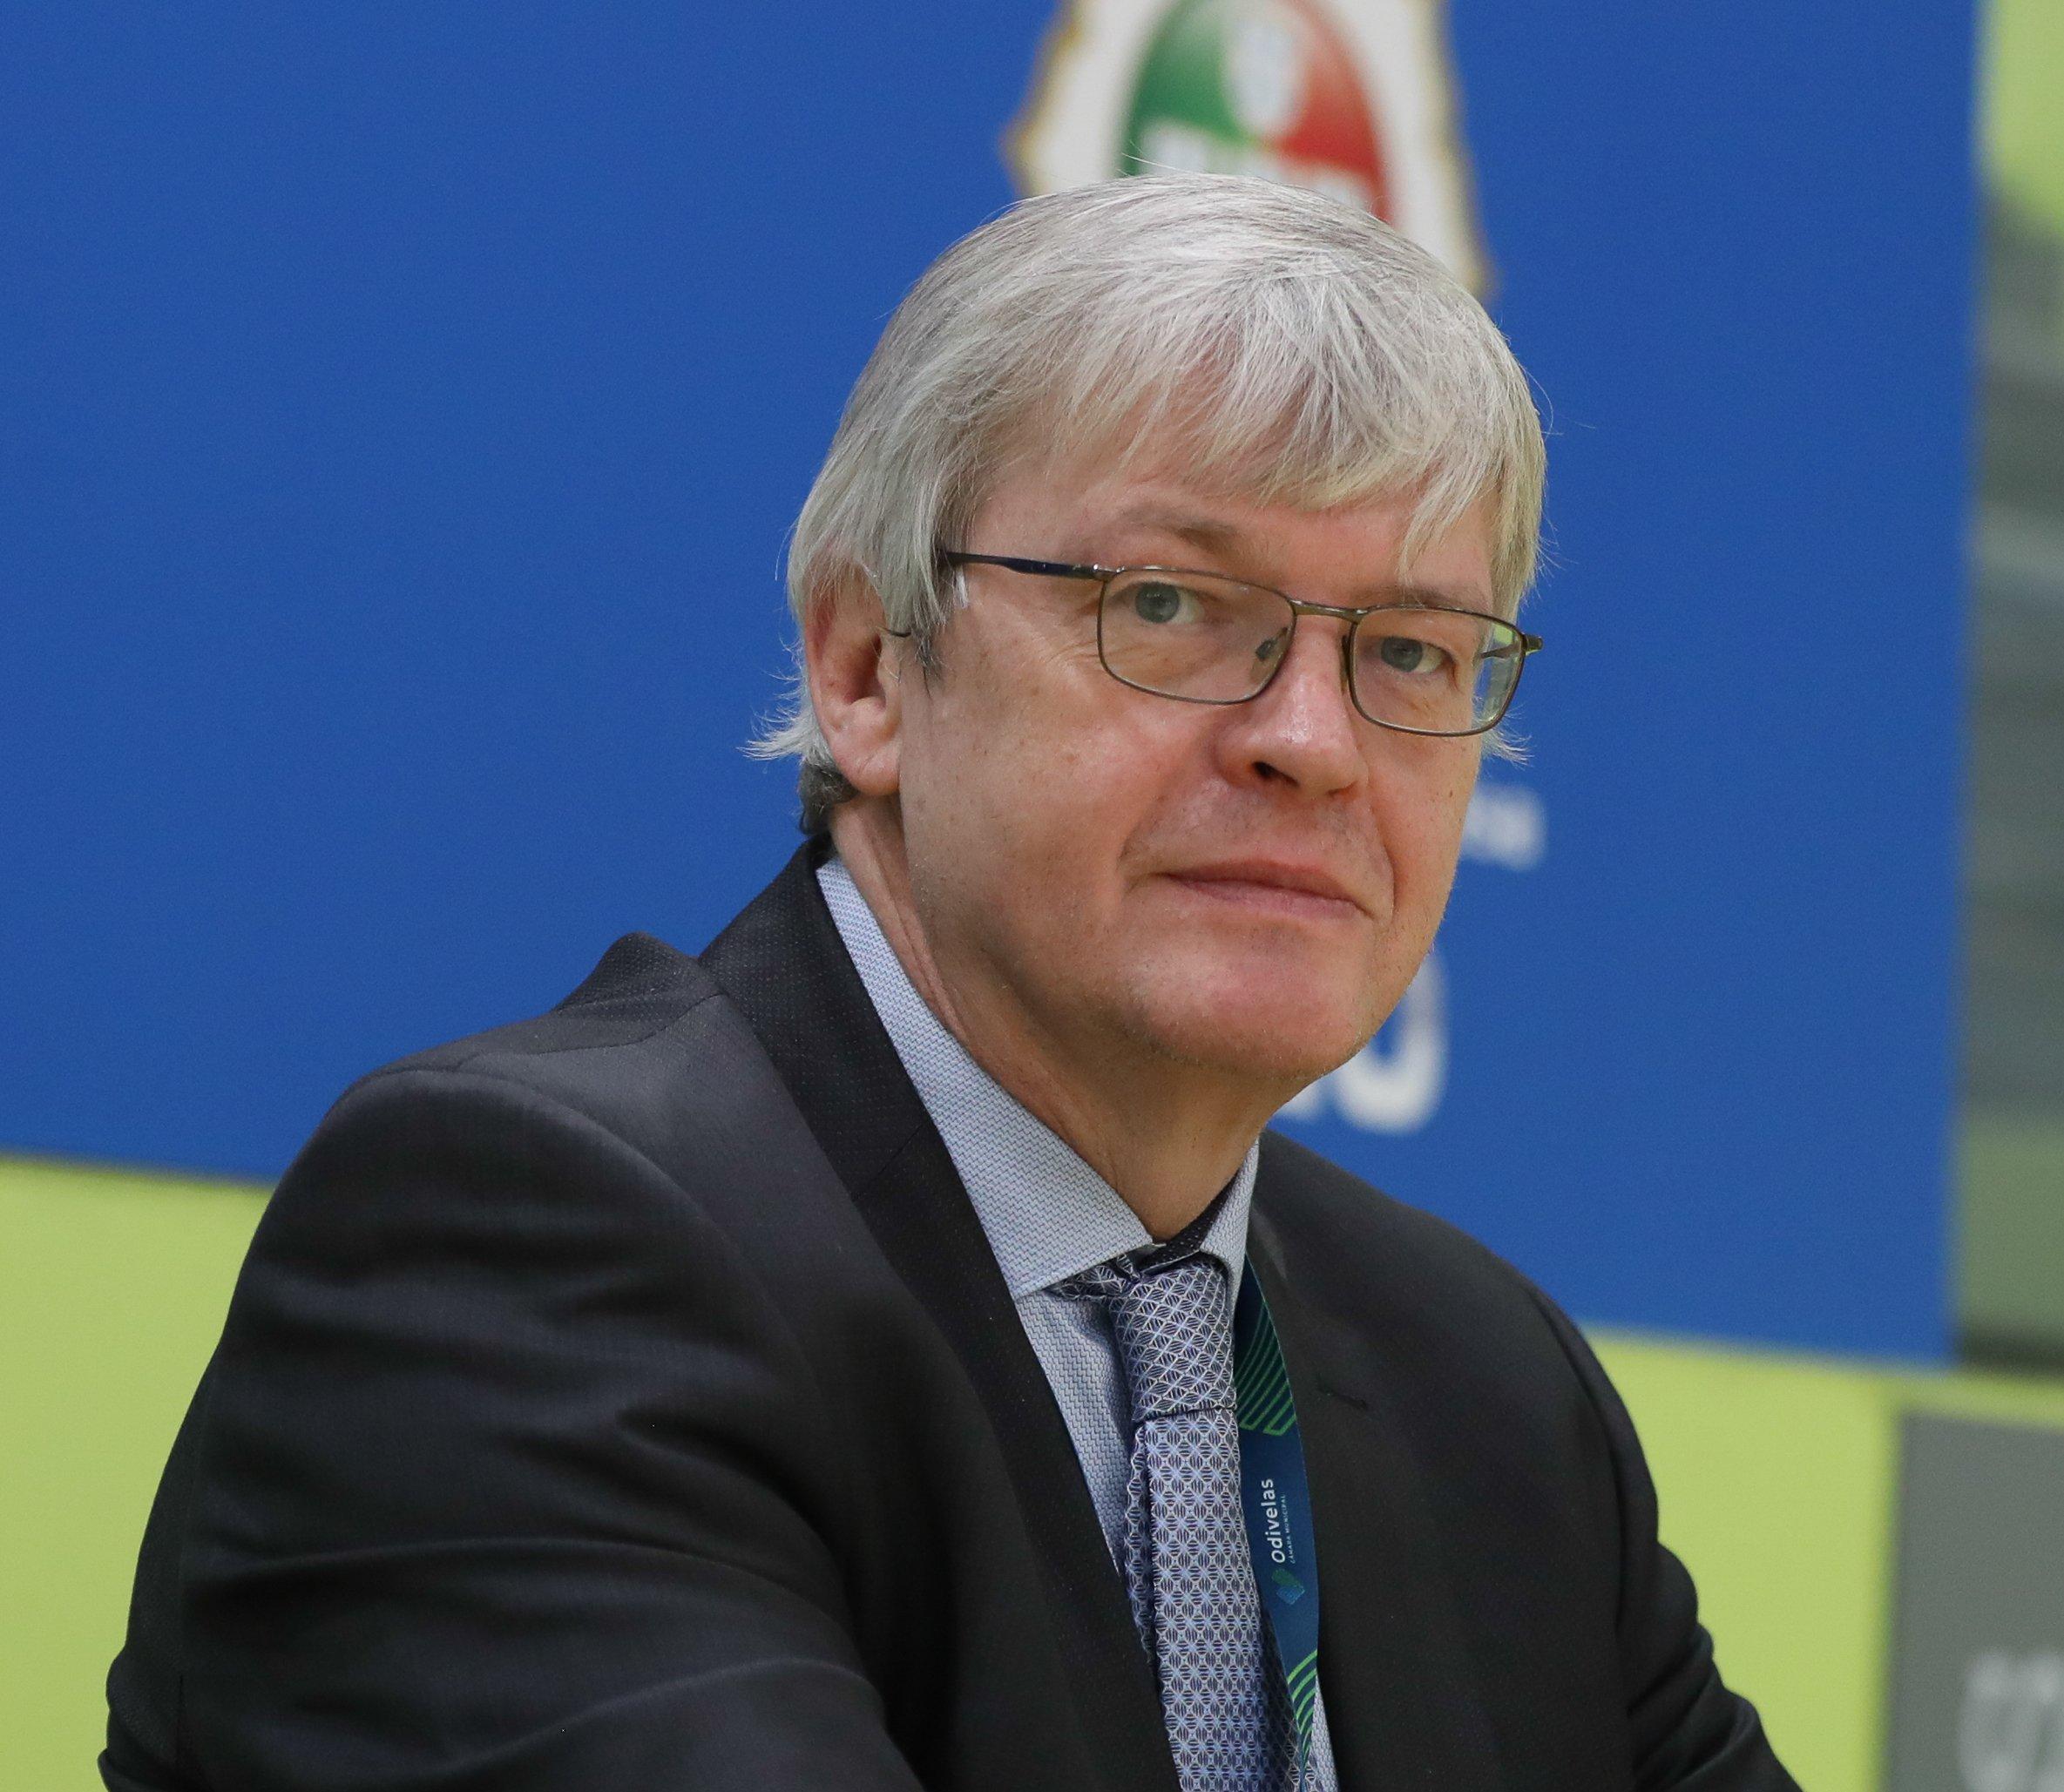 Dr. Peter Smolders